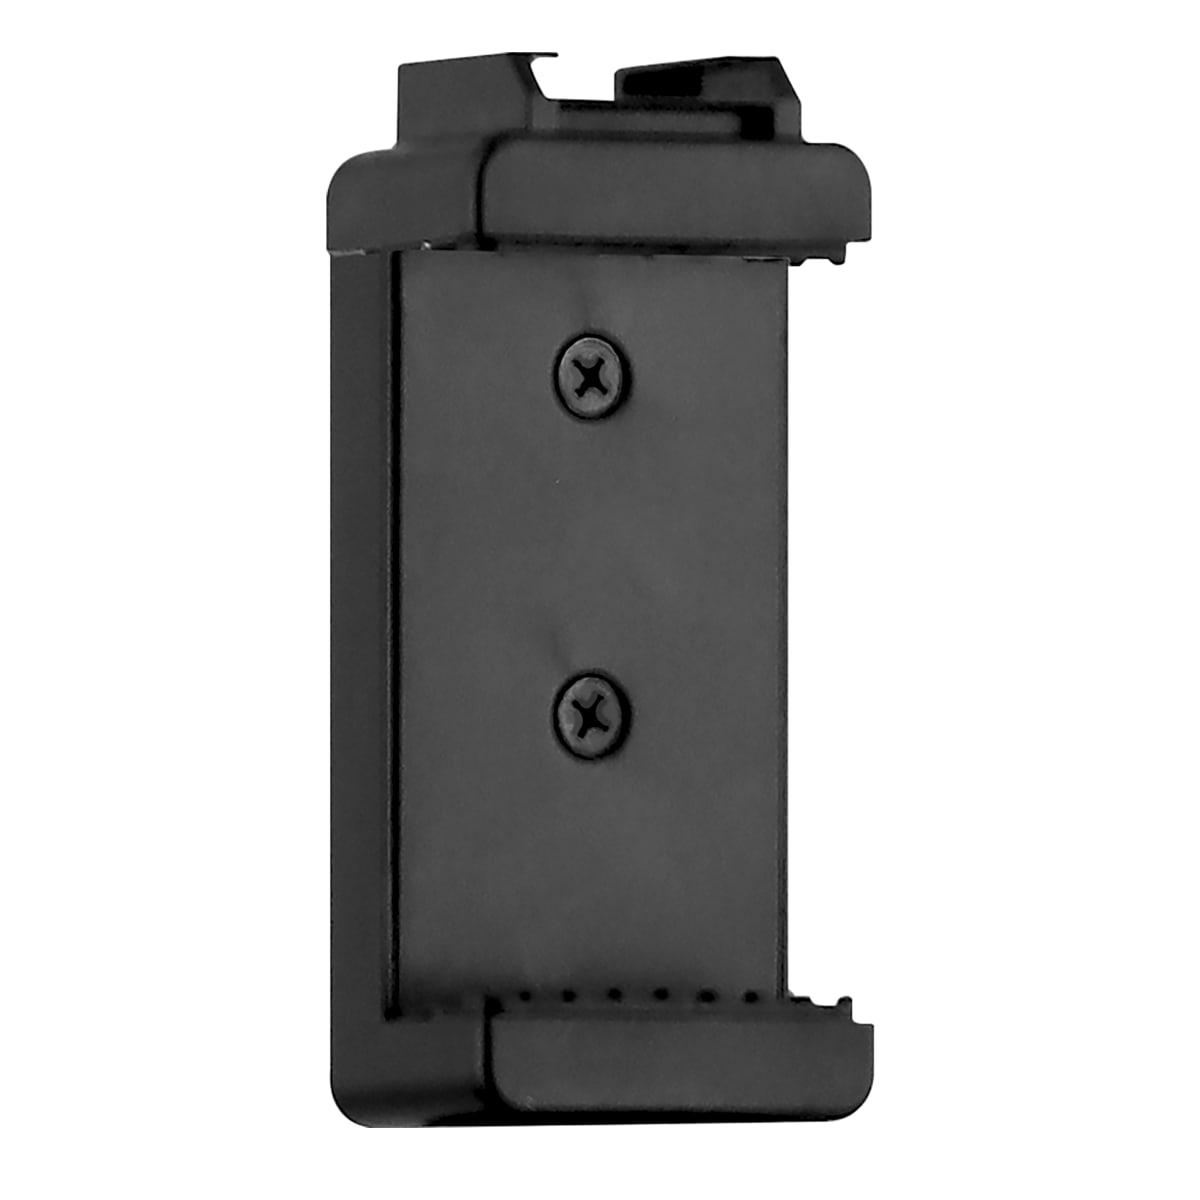 Tripod smartphone holder - INFLUENCE